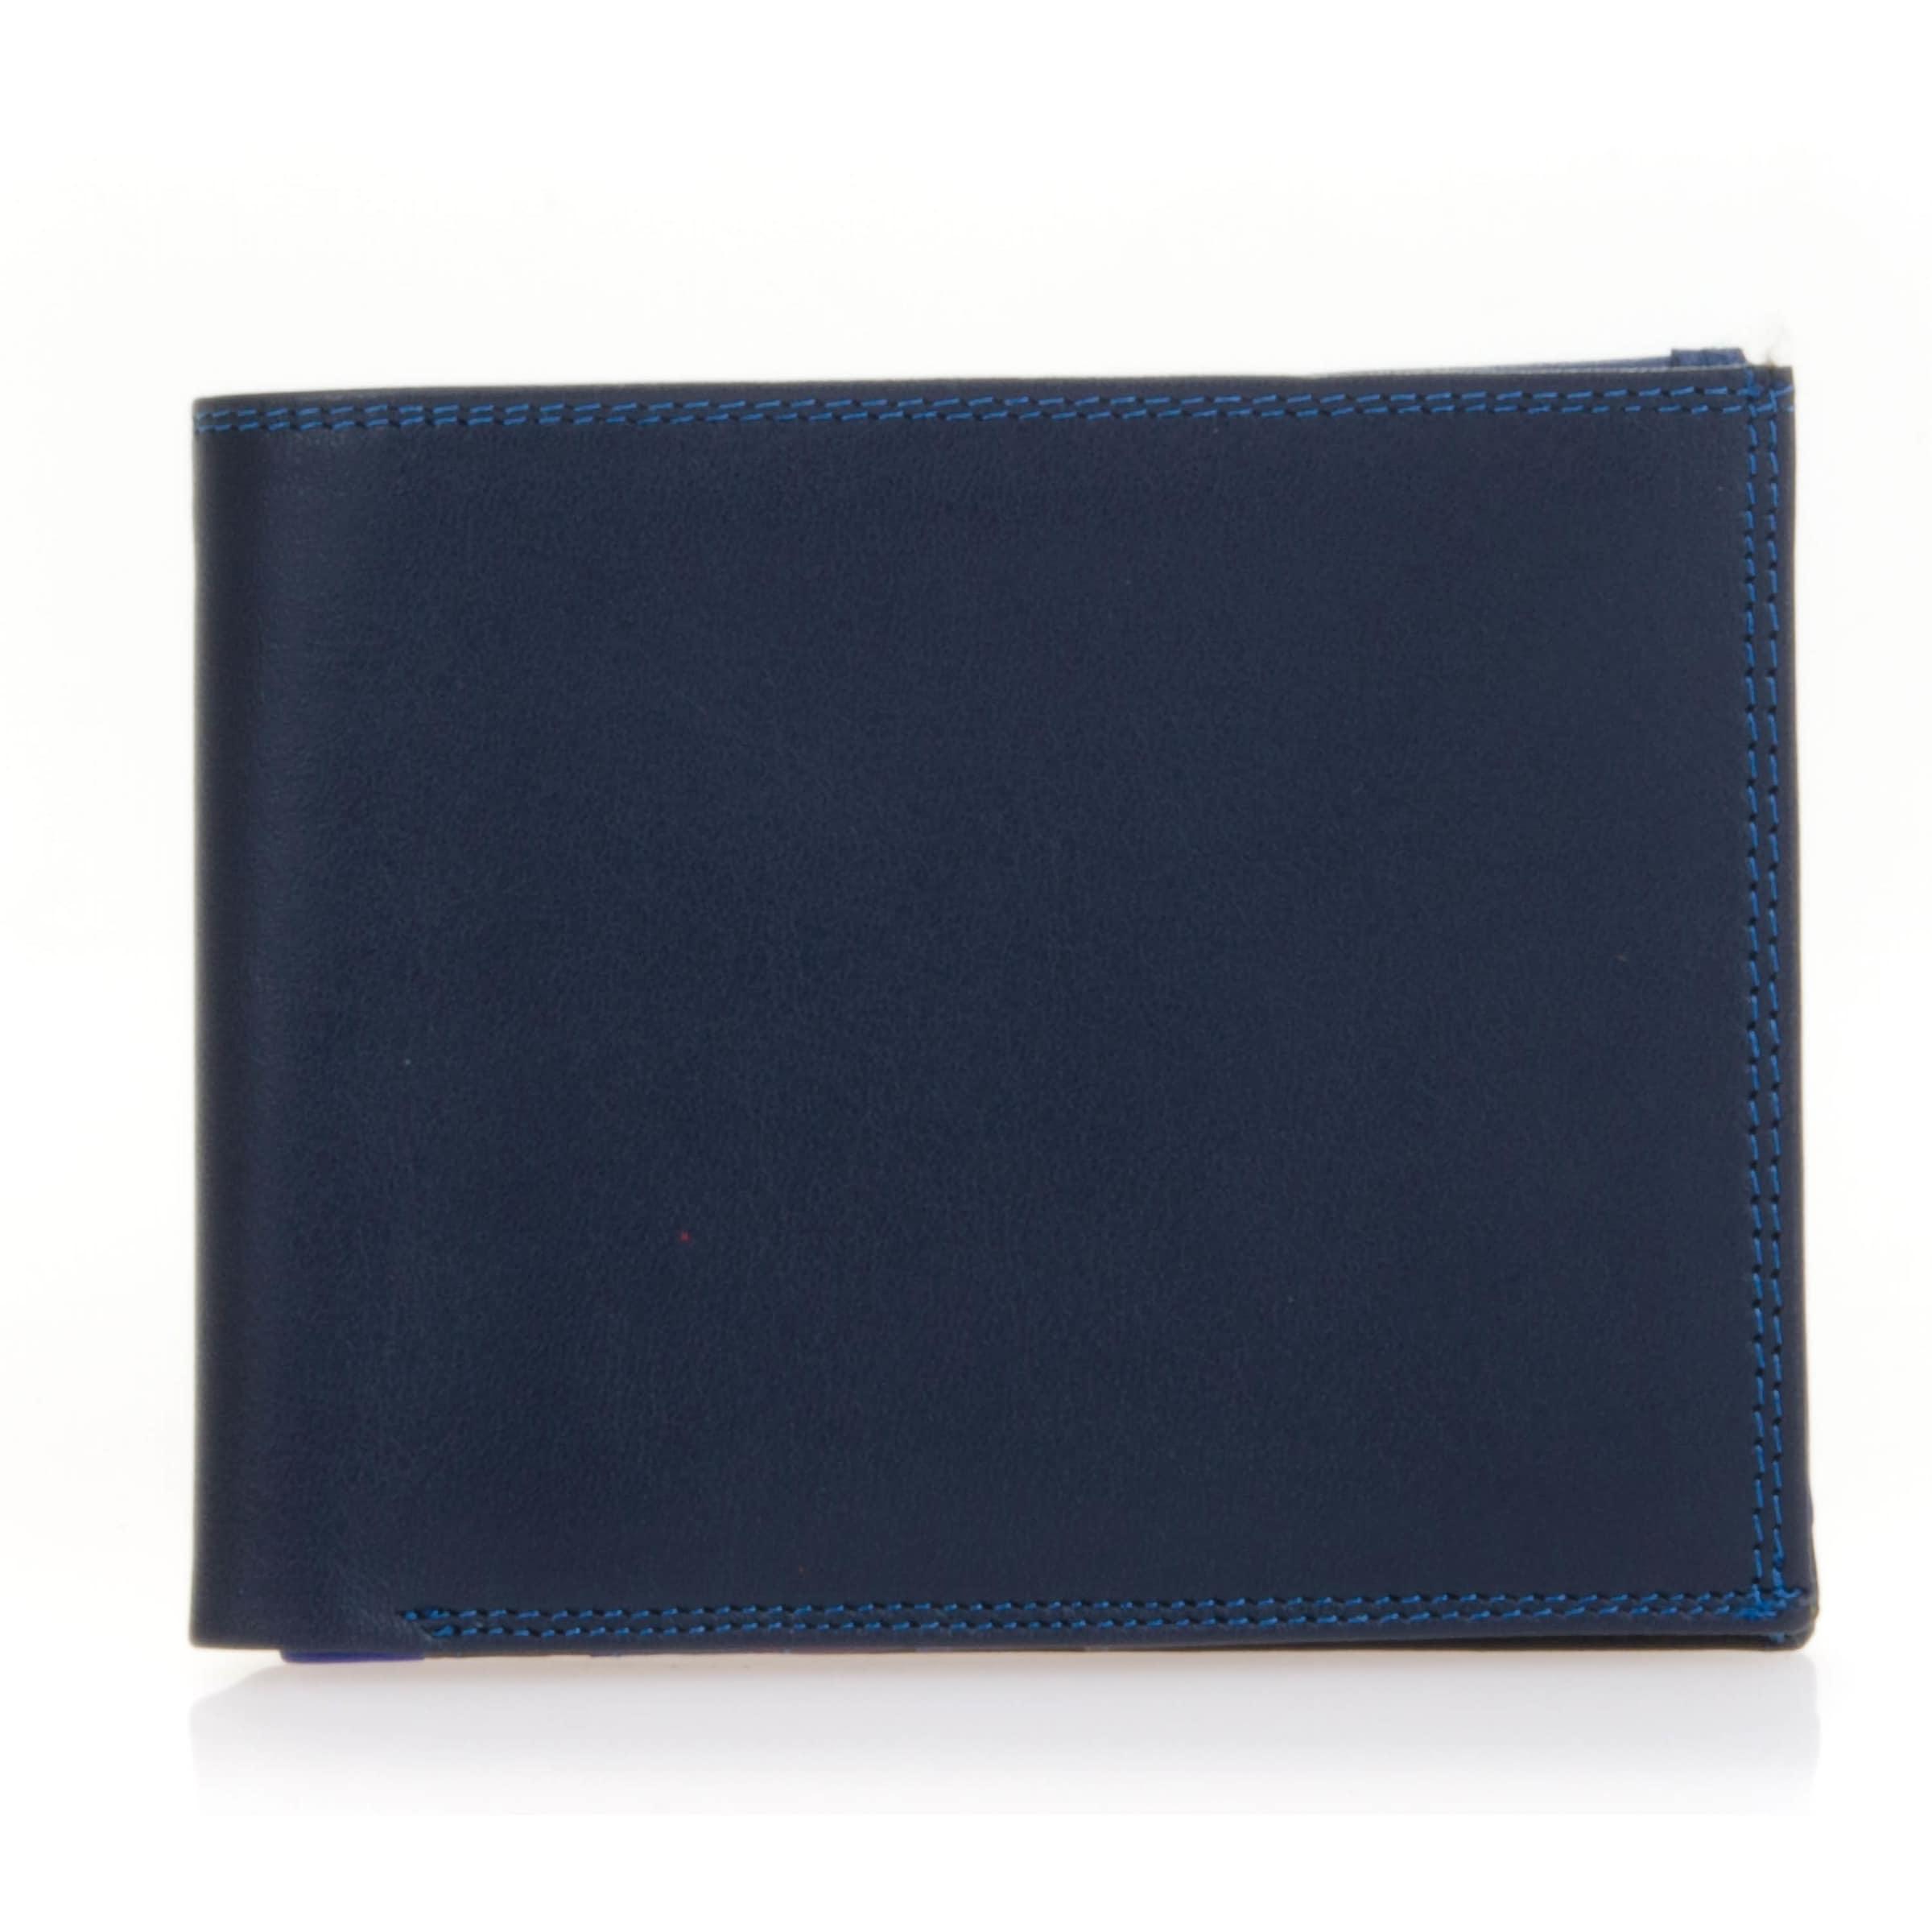 Mywalit In Nachtblau BlauMarine Dunkellila Geldbörse vNm80wn